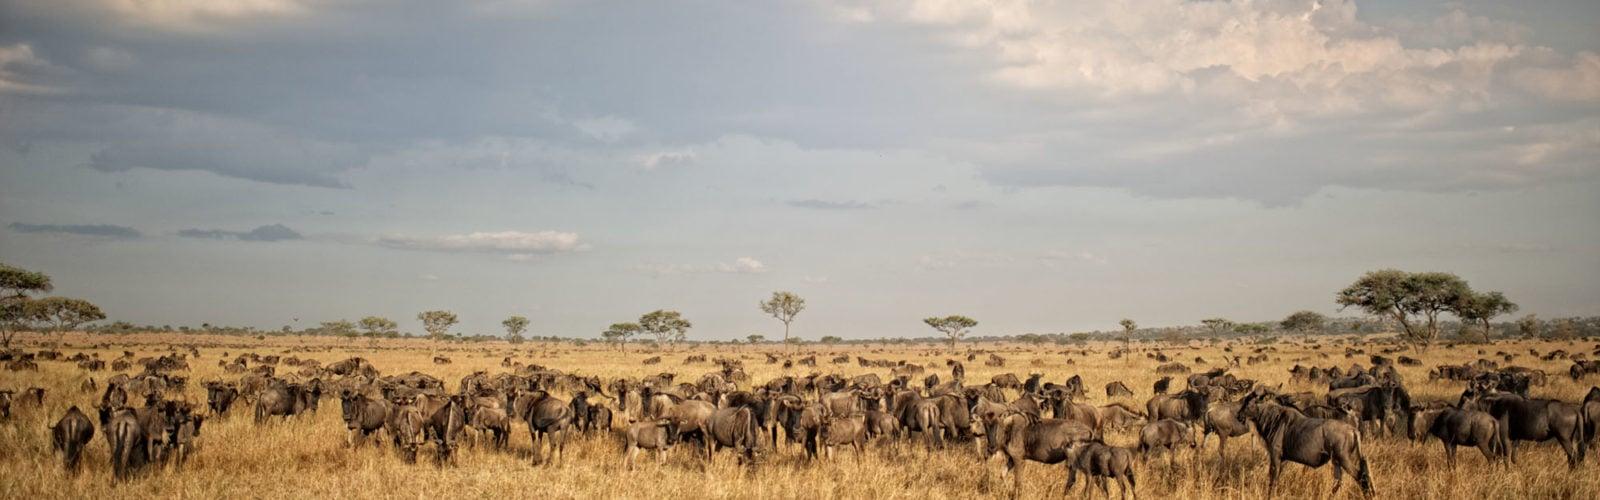 tanzania-serengeti-migration